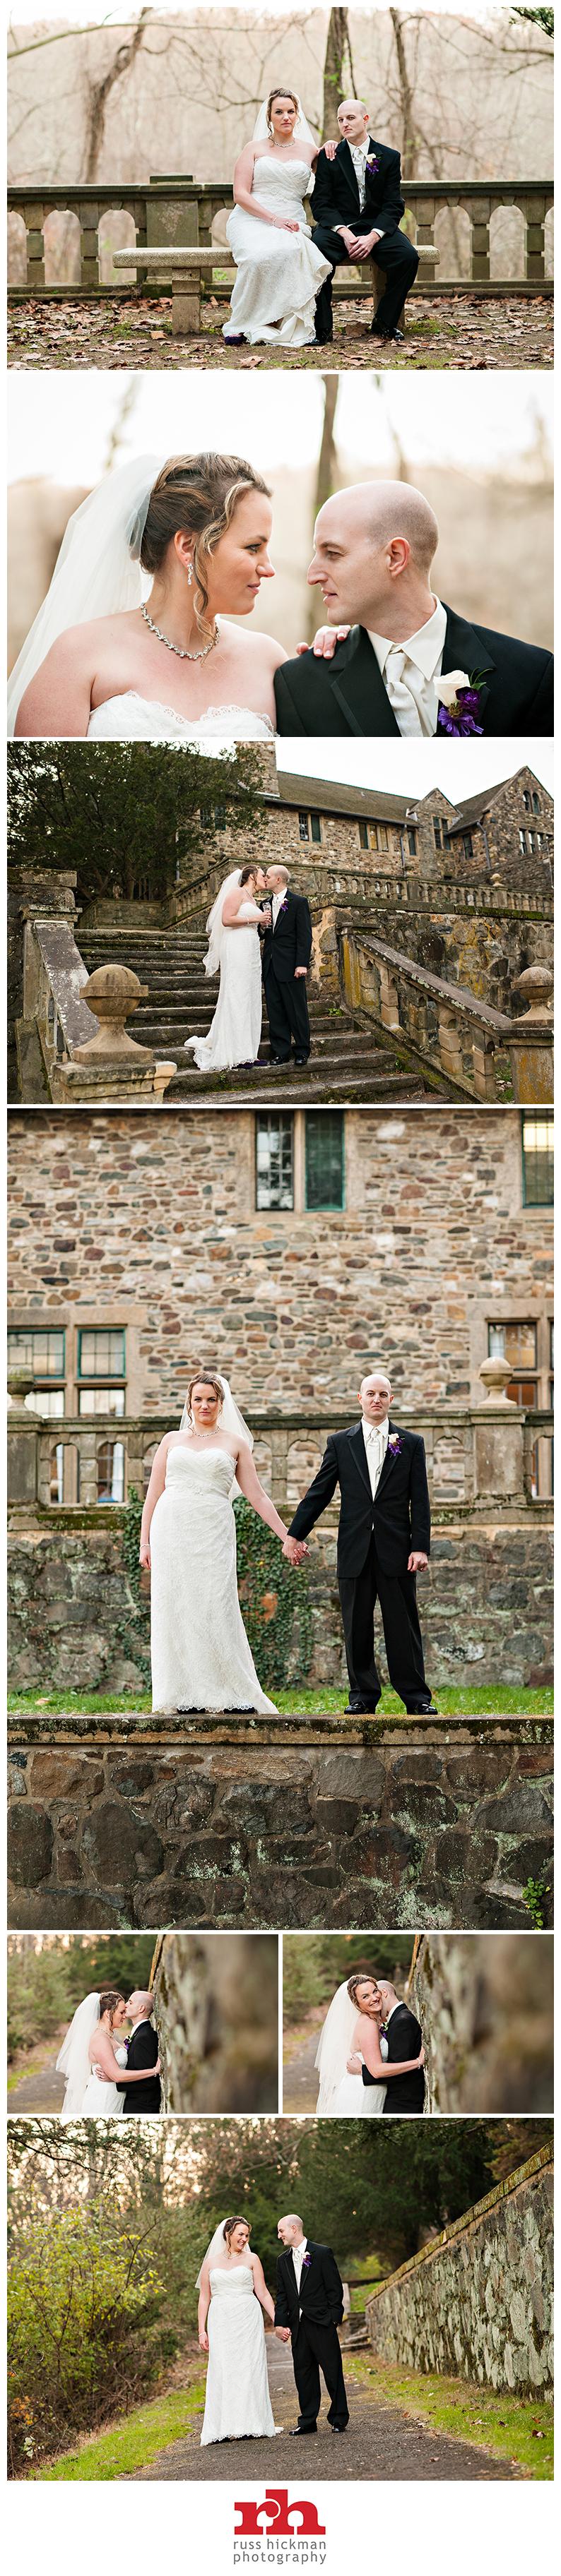 Philadelphia Wedding Photographer ABWB0006